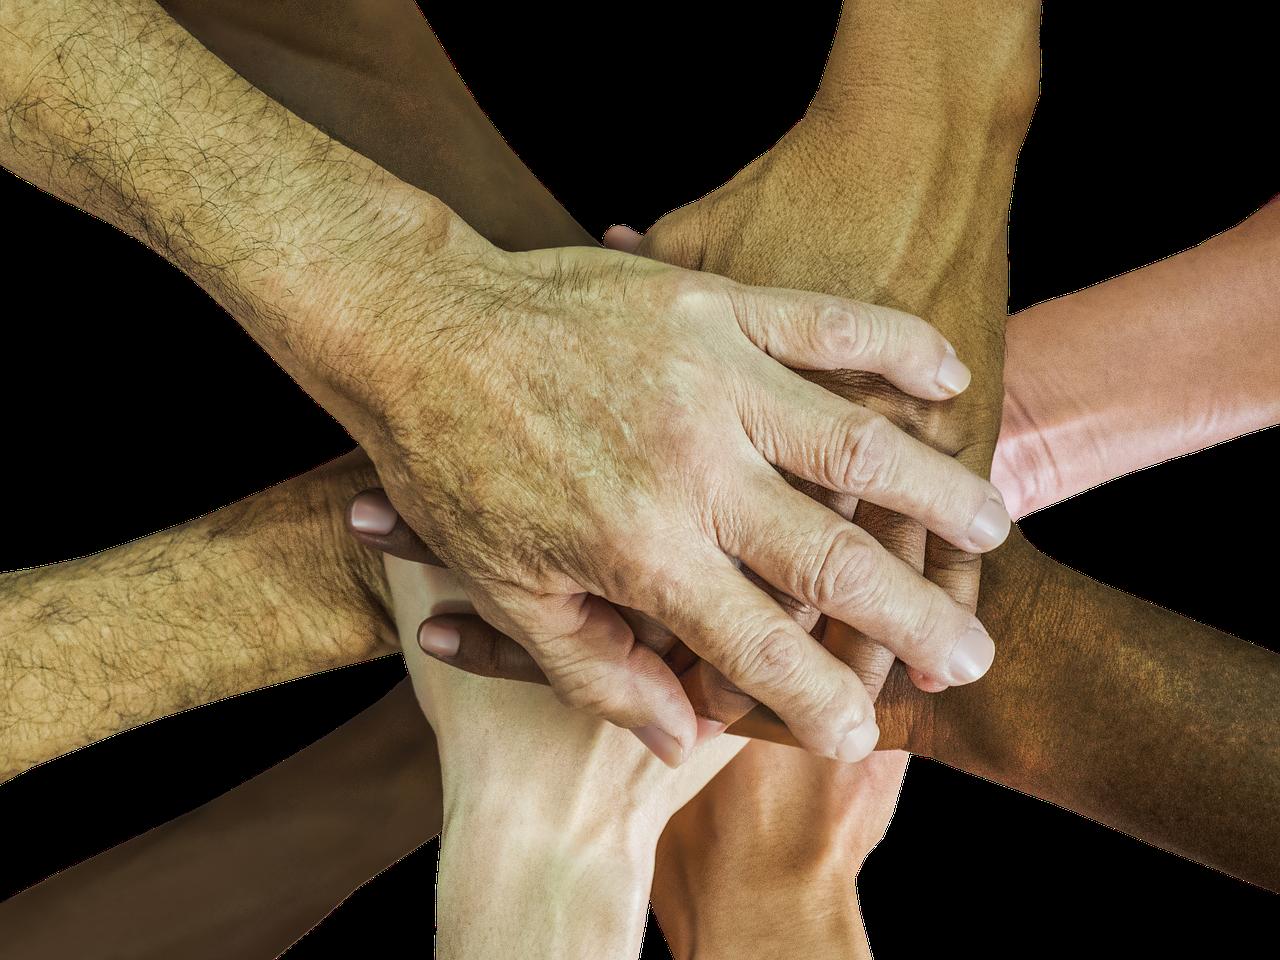 hands, teamwork, team-spirit